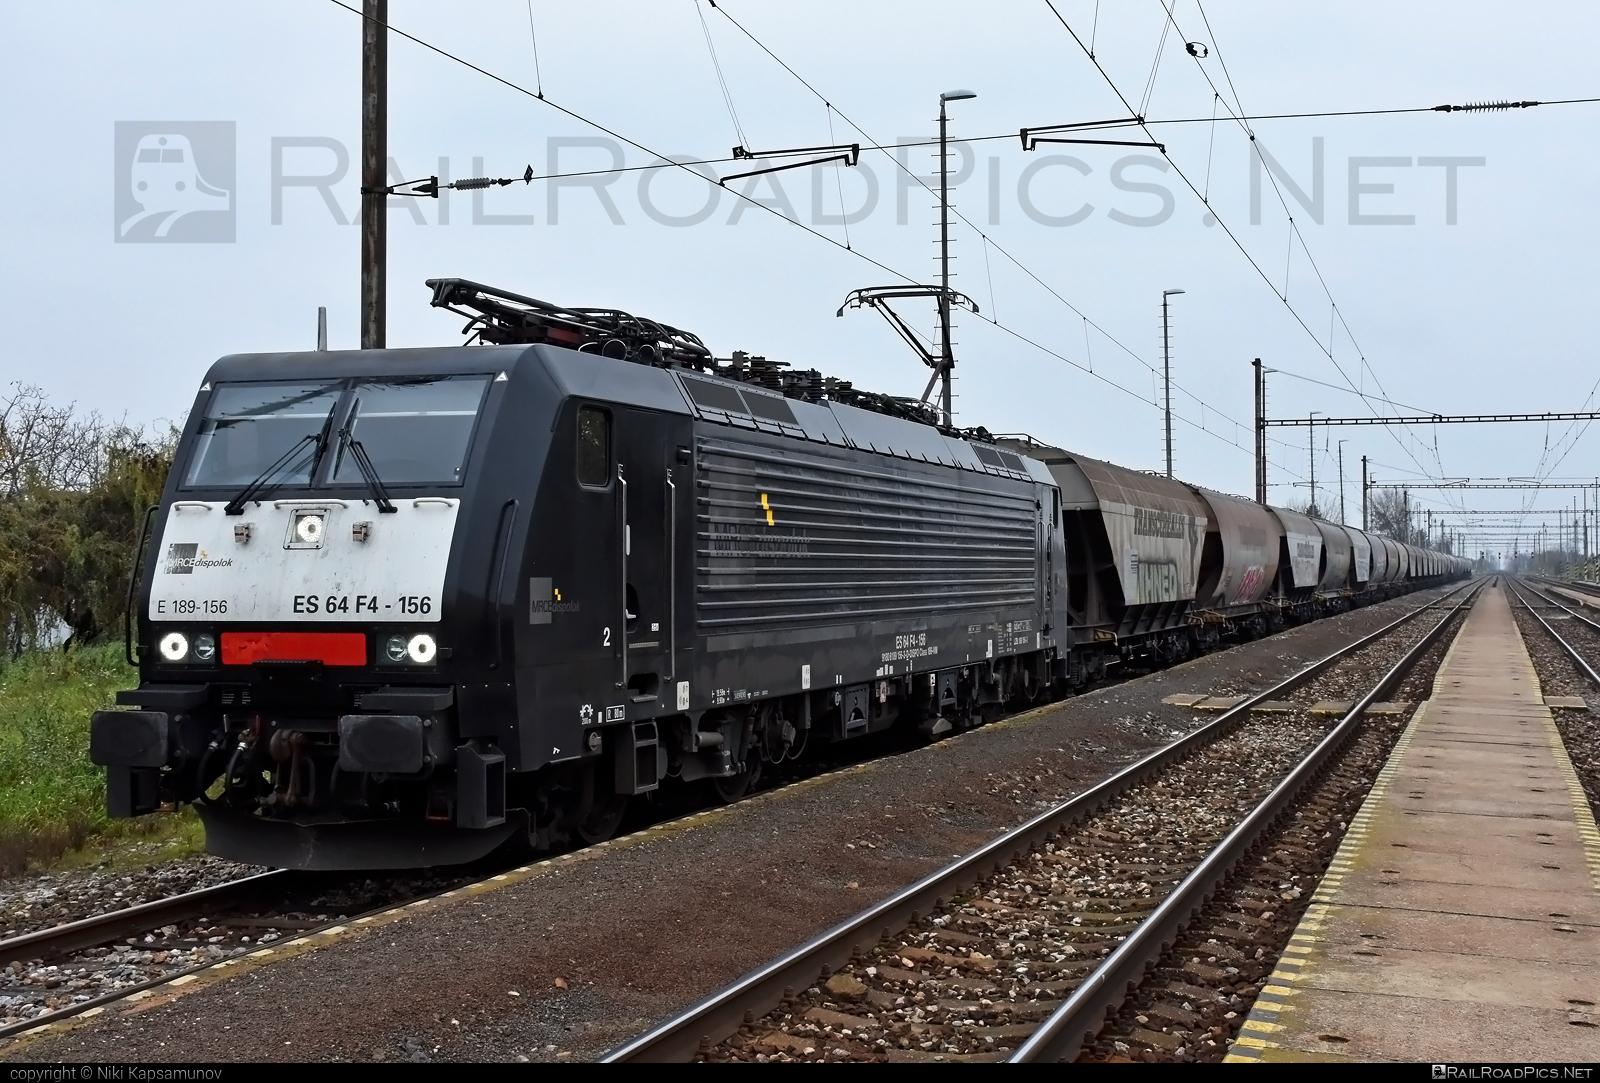 Siemens ES 64 F4 - 189 156-3 operated by Retrack Slovakia s. r. o. #dispolok #es64 #es64f4 #eurosprinter #hopperwagon #mitsuirailcapitaleurope #mitsuirailcapitaleuropegmbh #mrce #retrack #retrackslovakia #siemens #siemenses64 #siemenses64f4 #transcereales